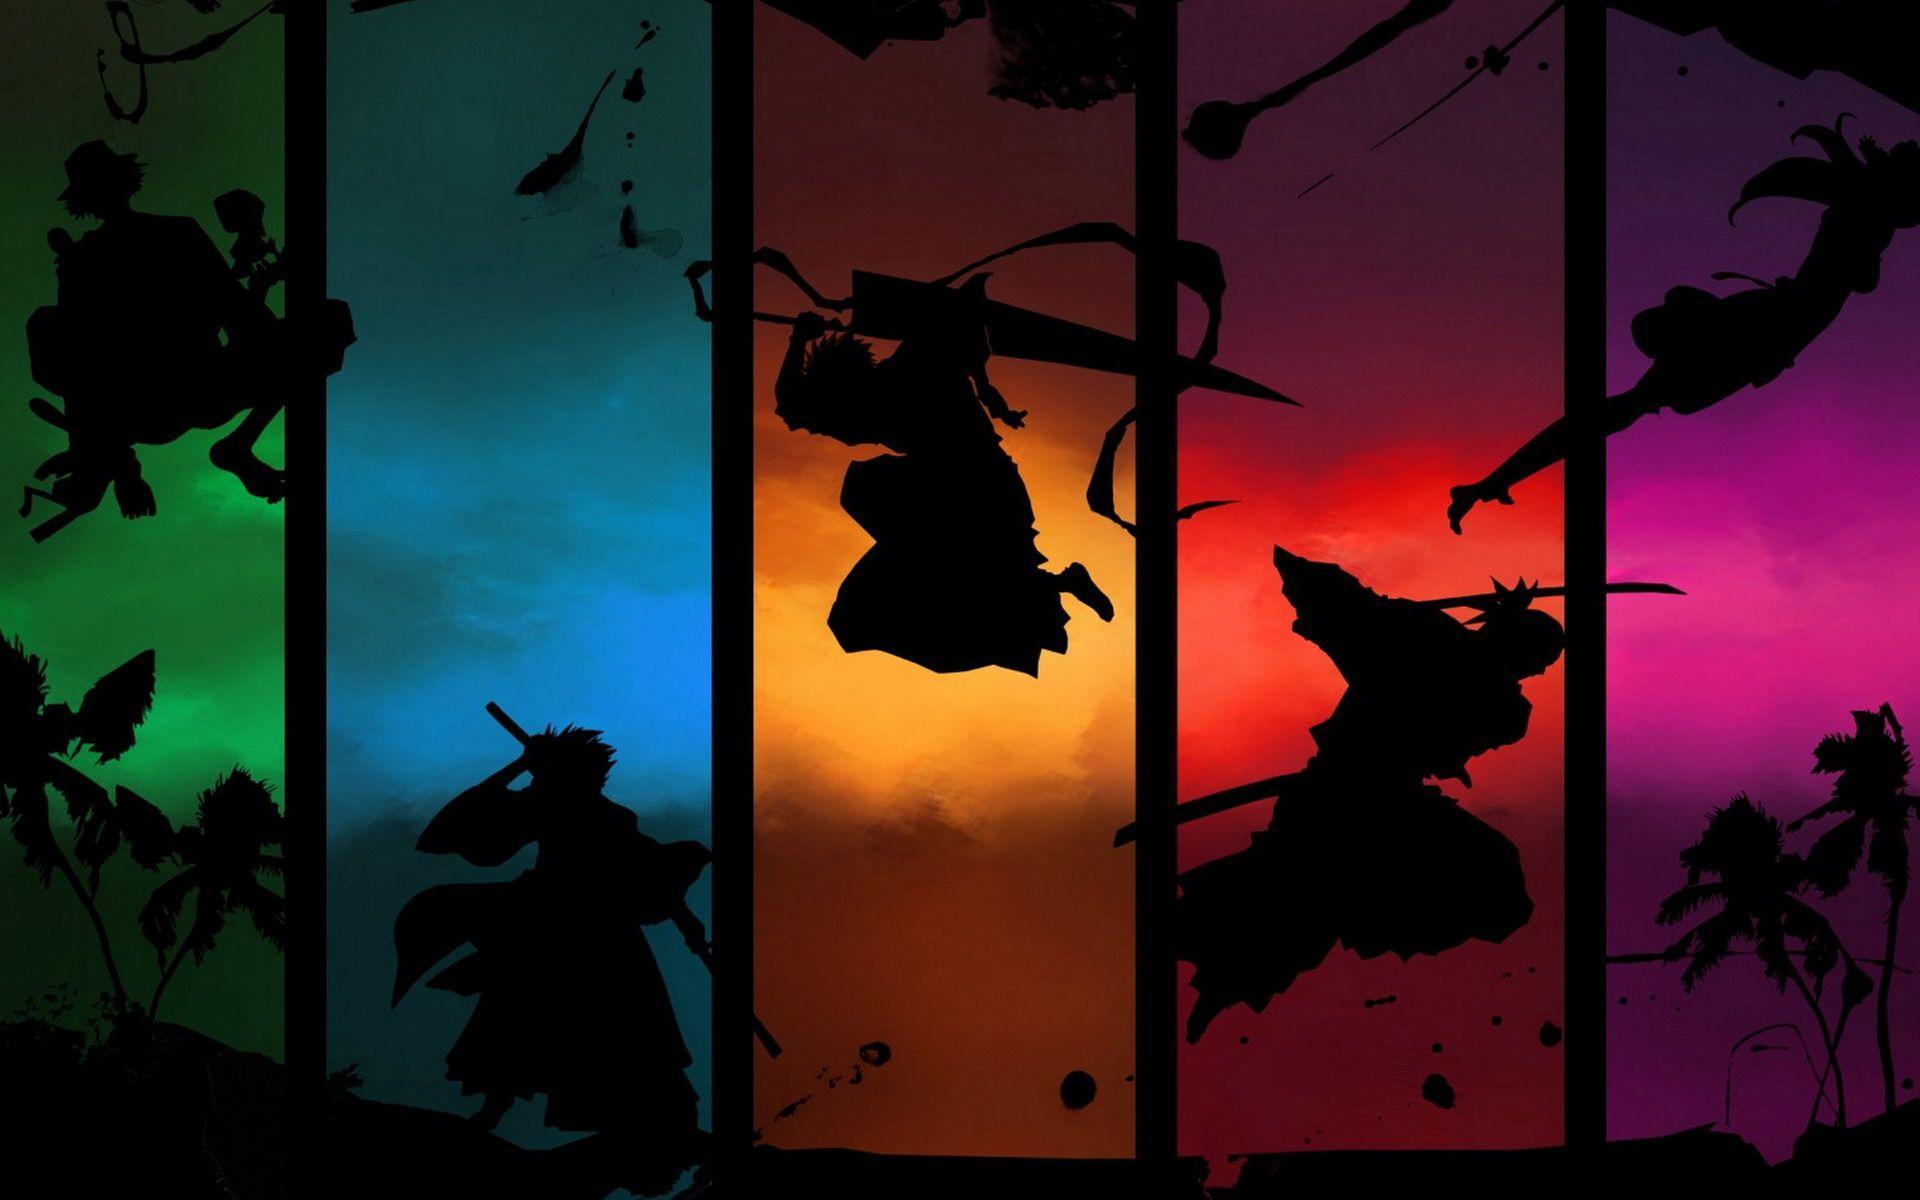 Bleach anime desktop wallpapers top free bleach anime - Wallpaper anime hp ...